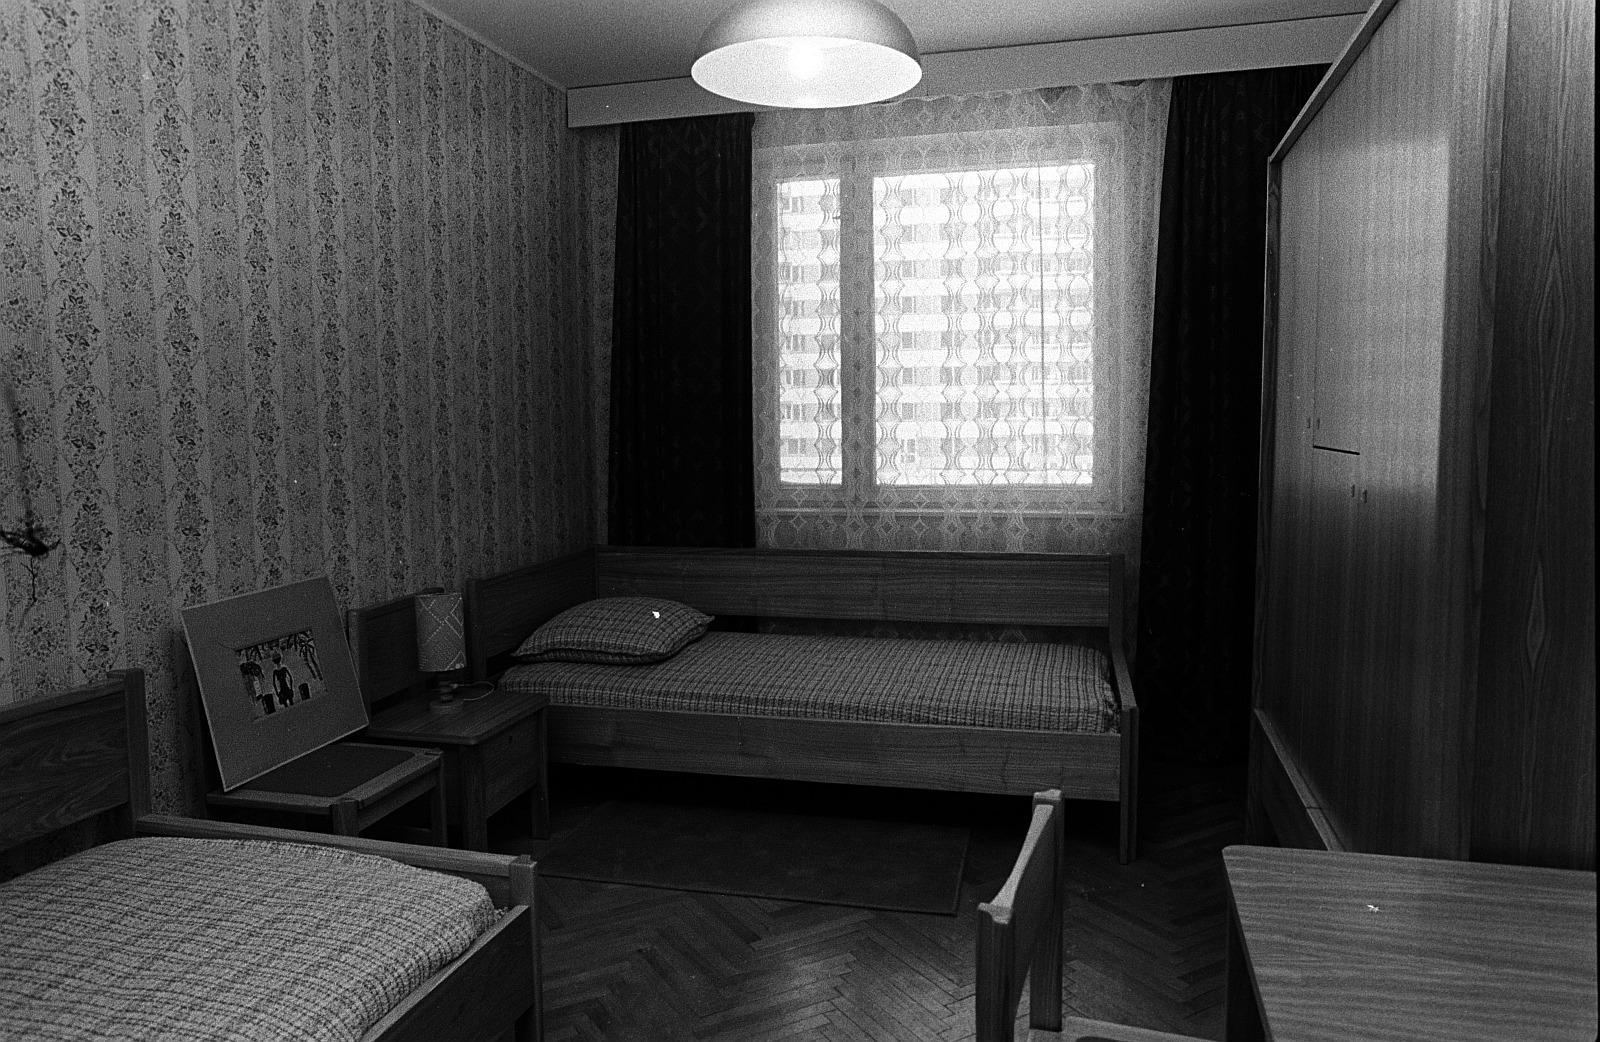 Гостиница «Салют». Номер гостиницы